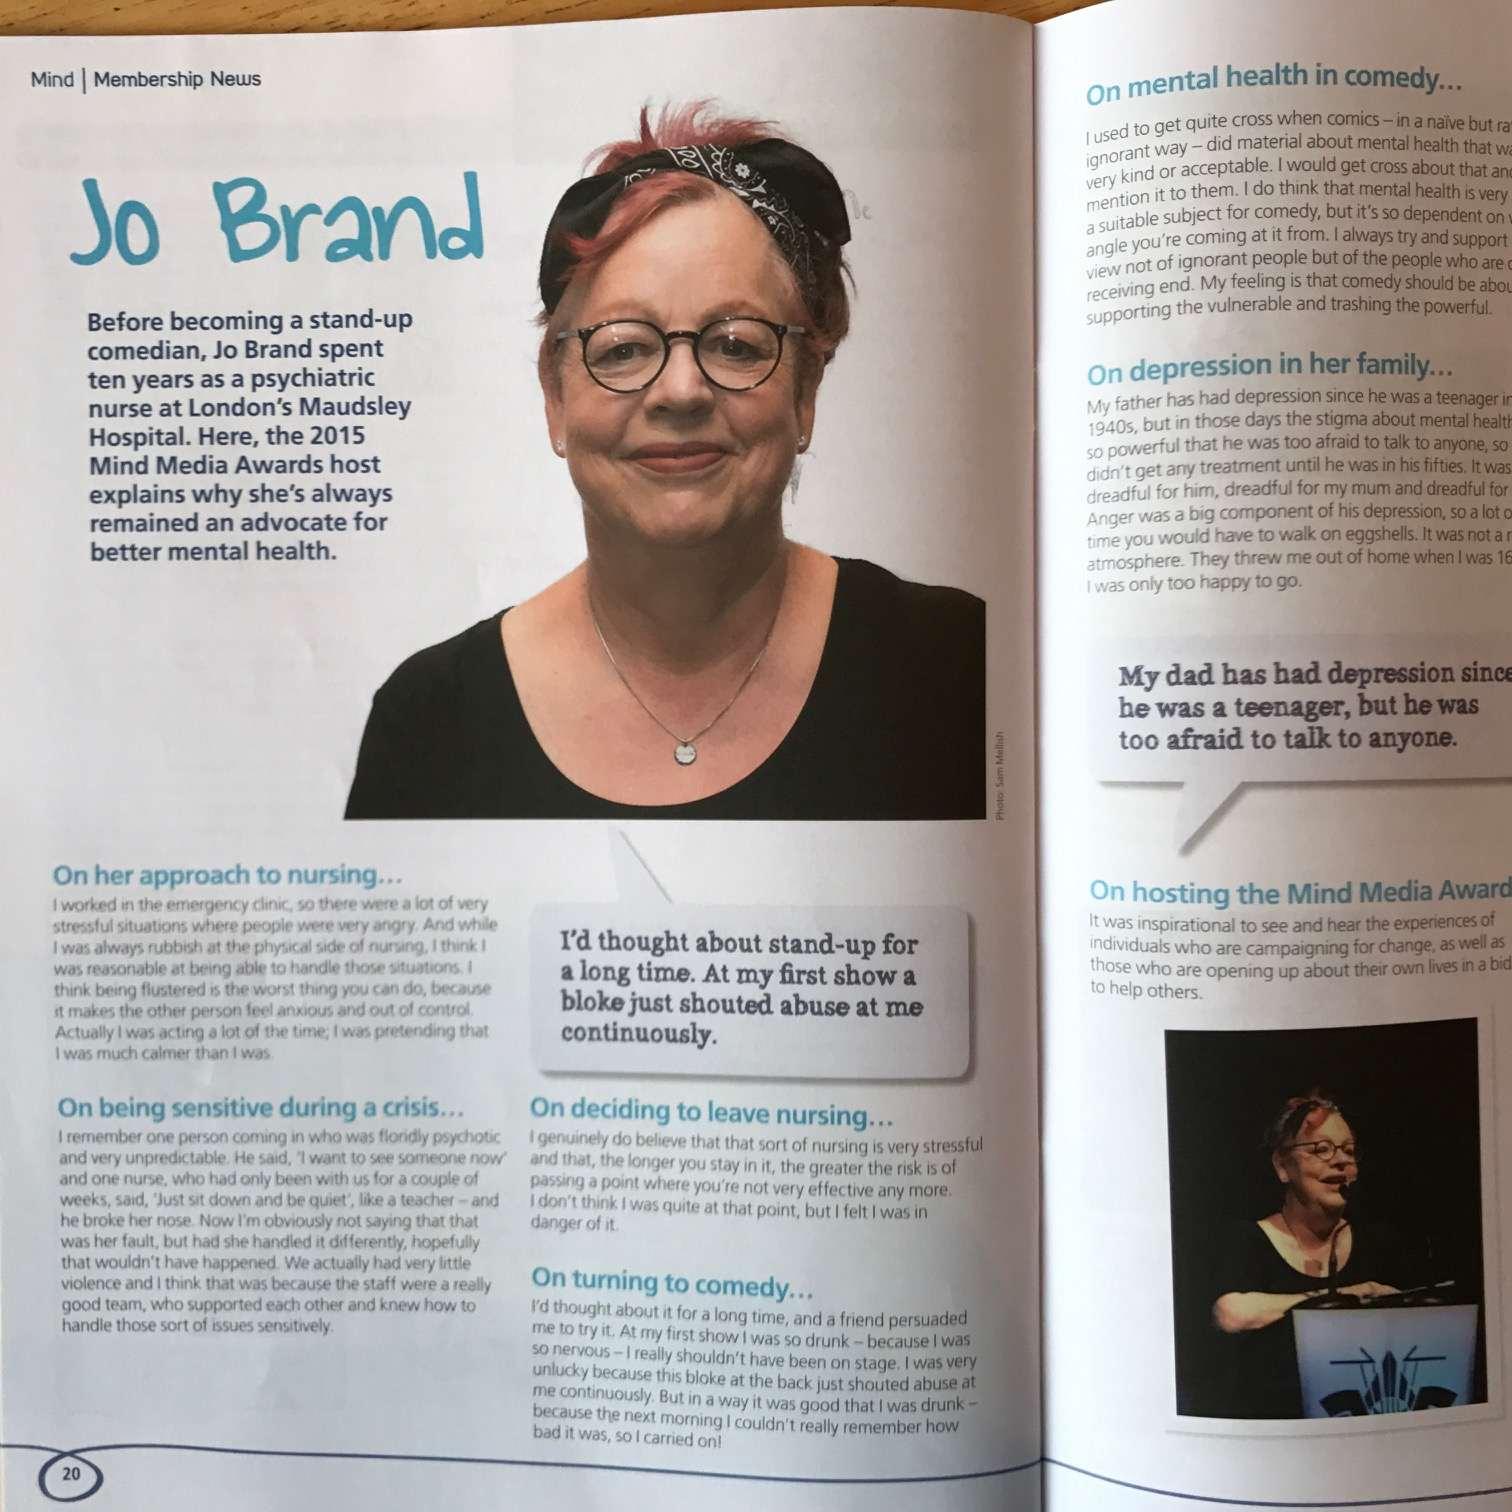 Jo Brand, who worked as a mental health nurse, in Mind Membership News